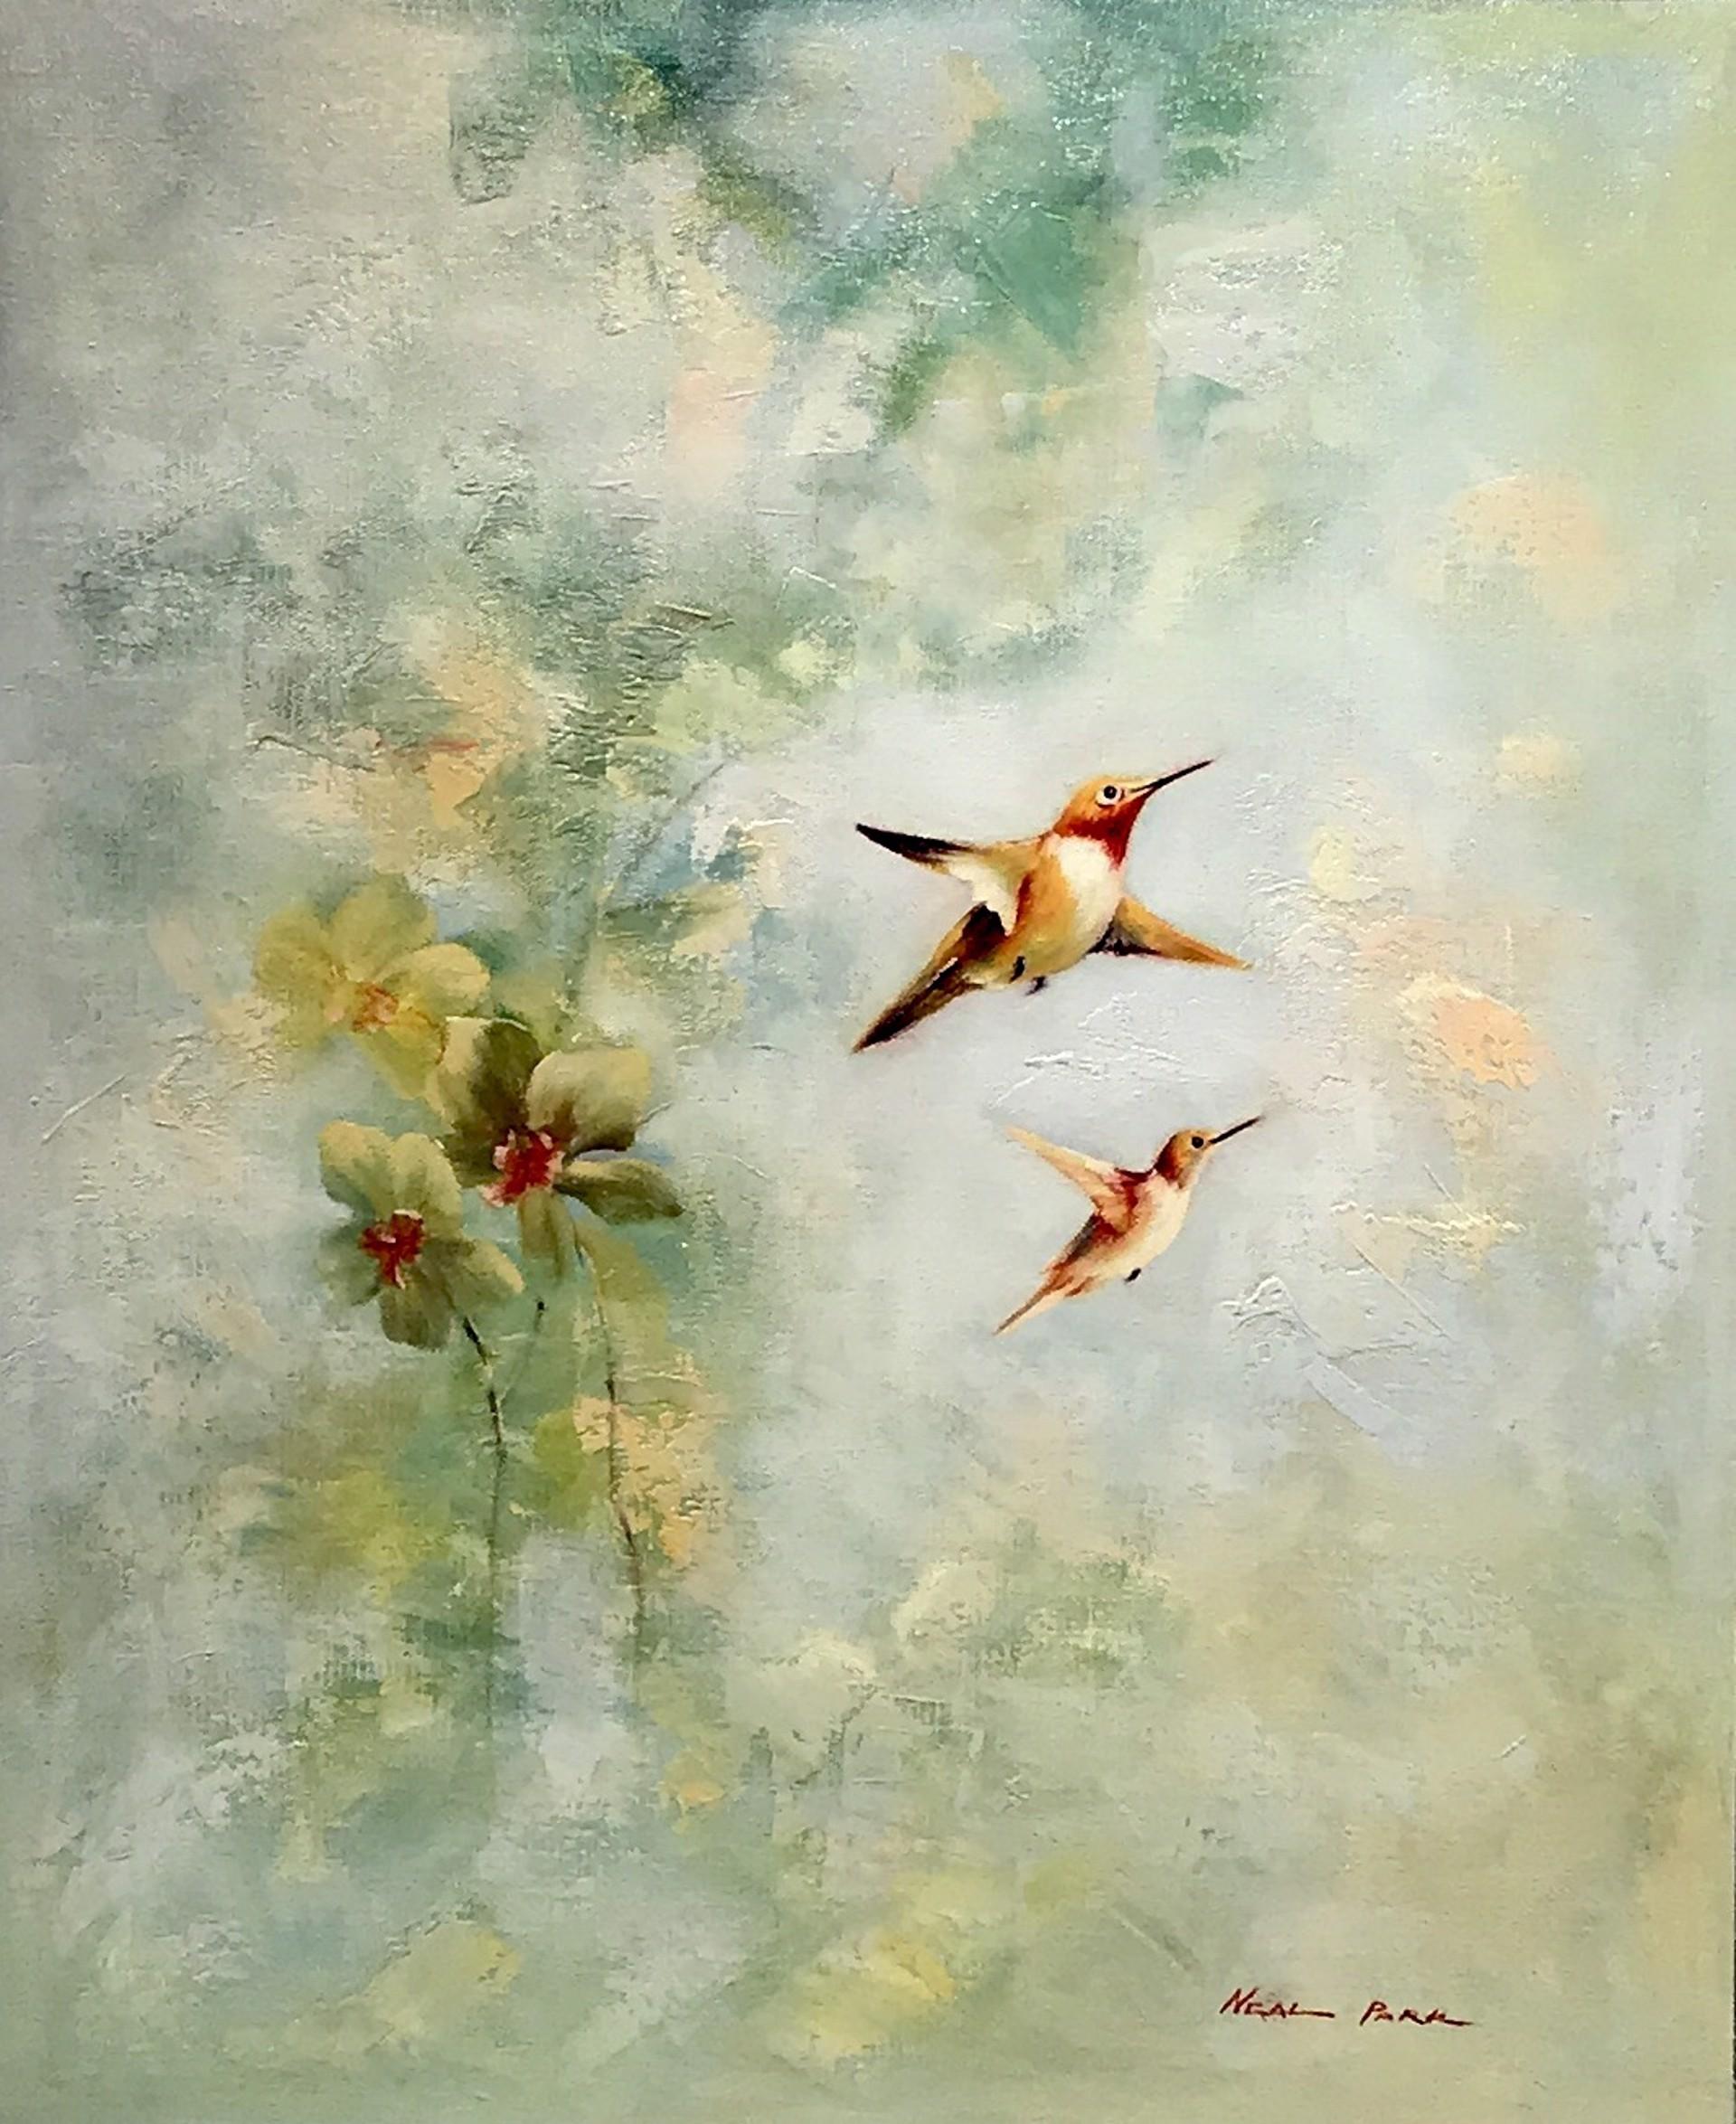 HUMMINGBIRDS by NEAL PARK